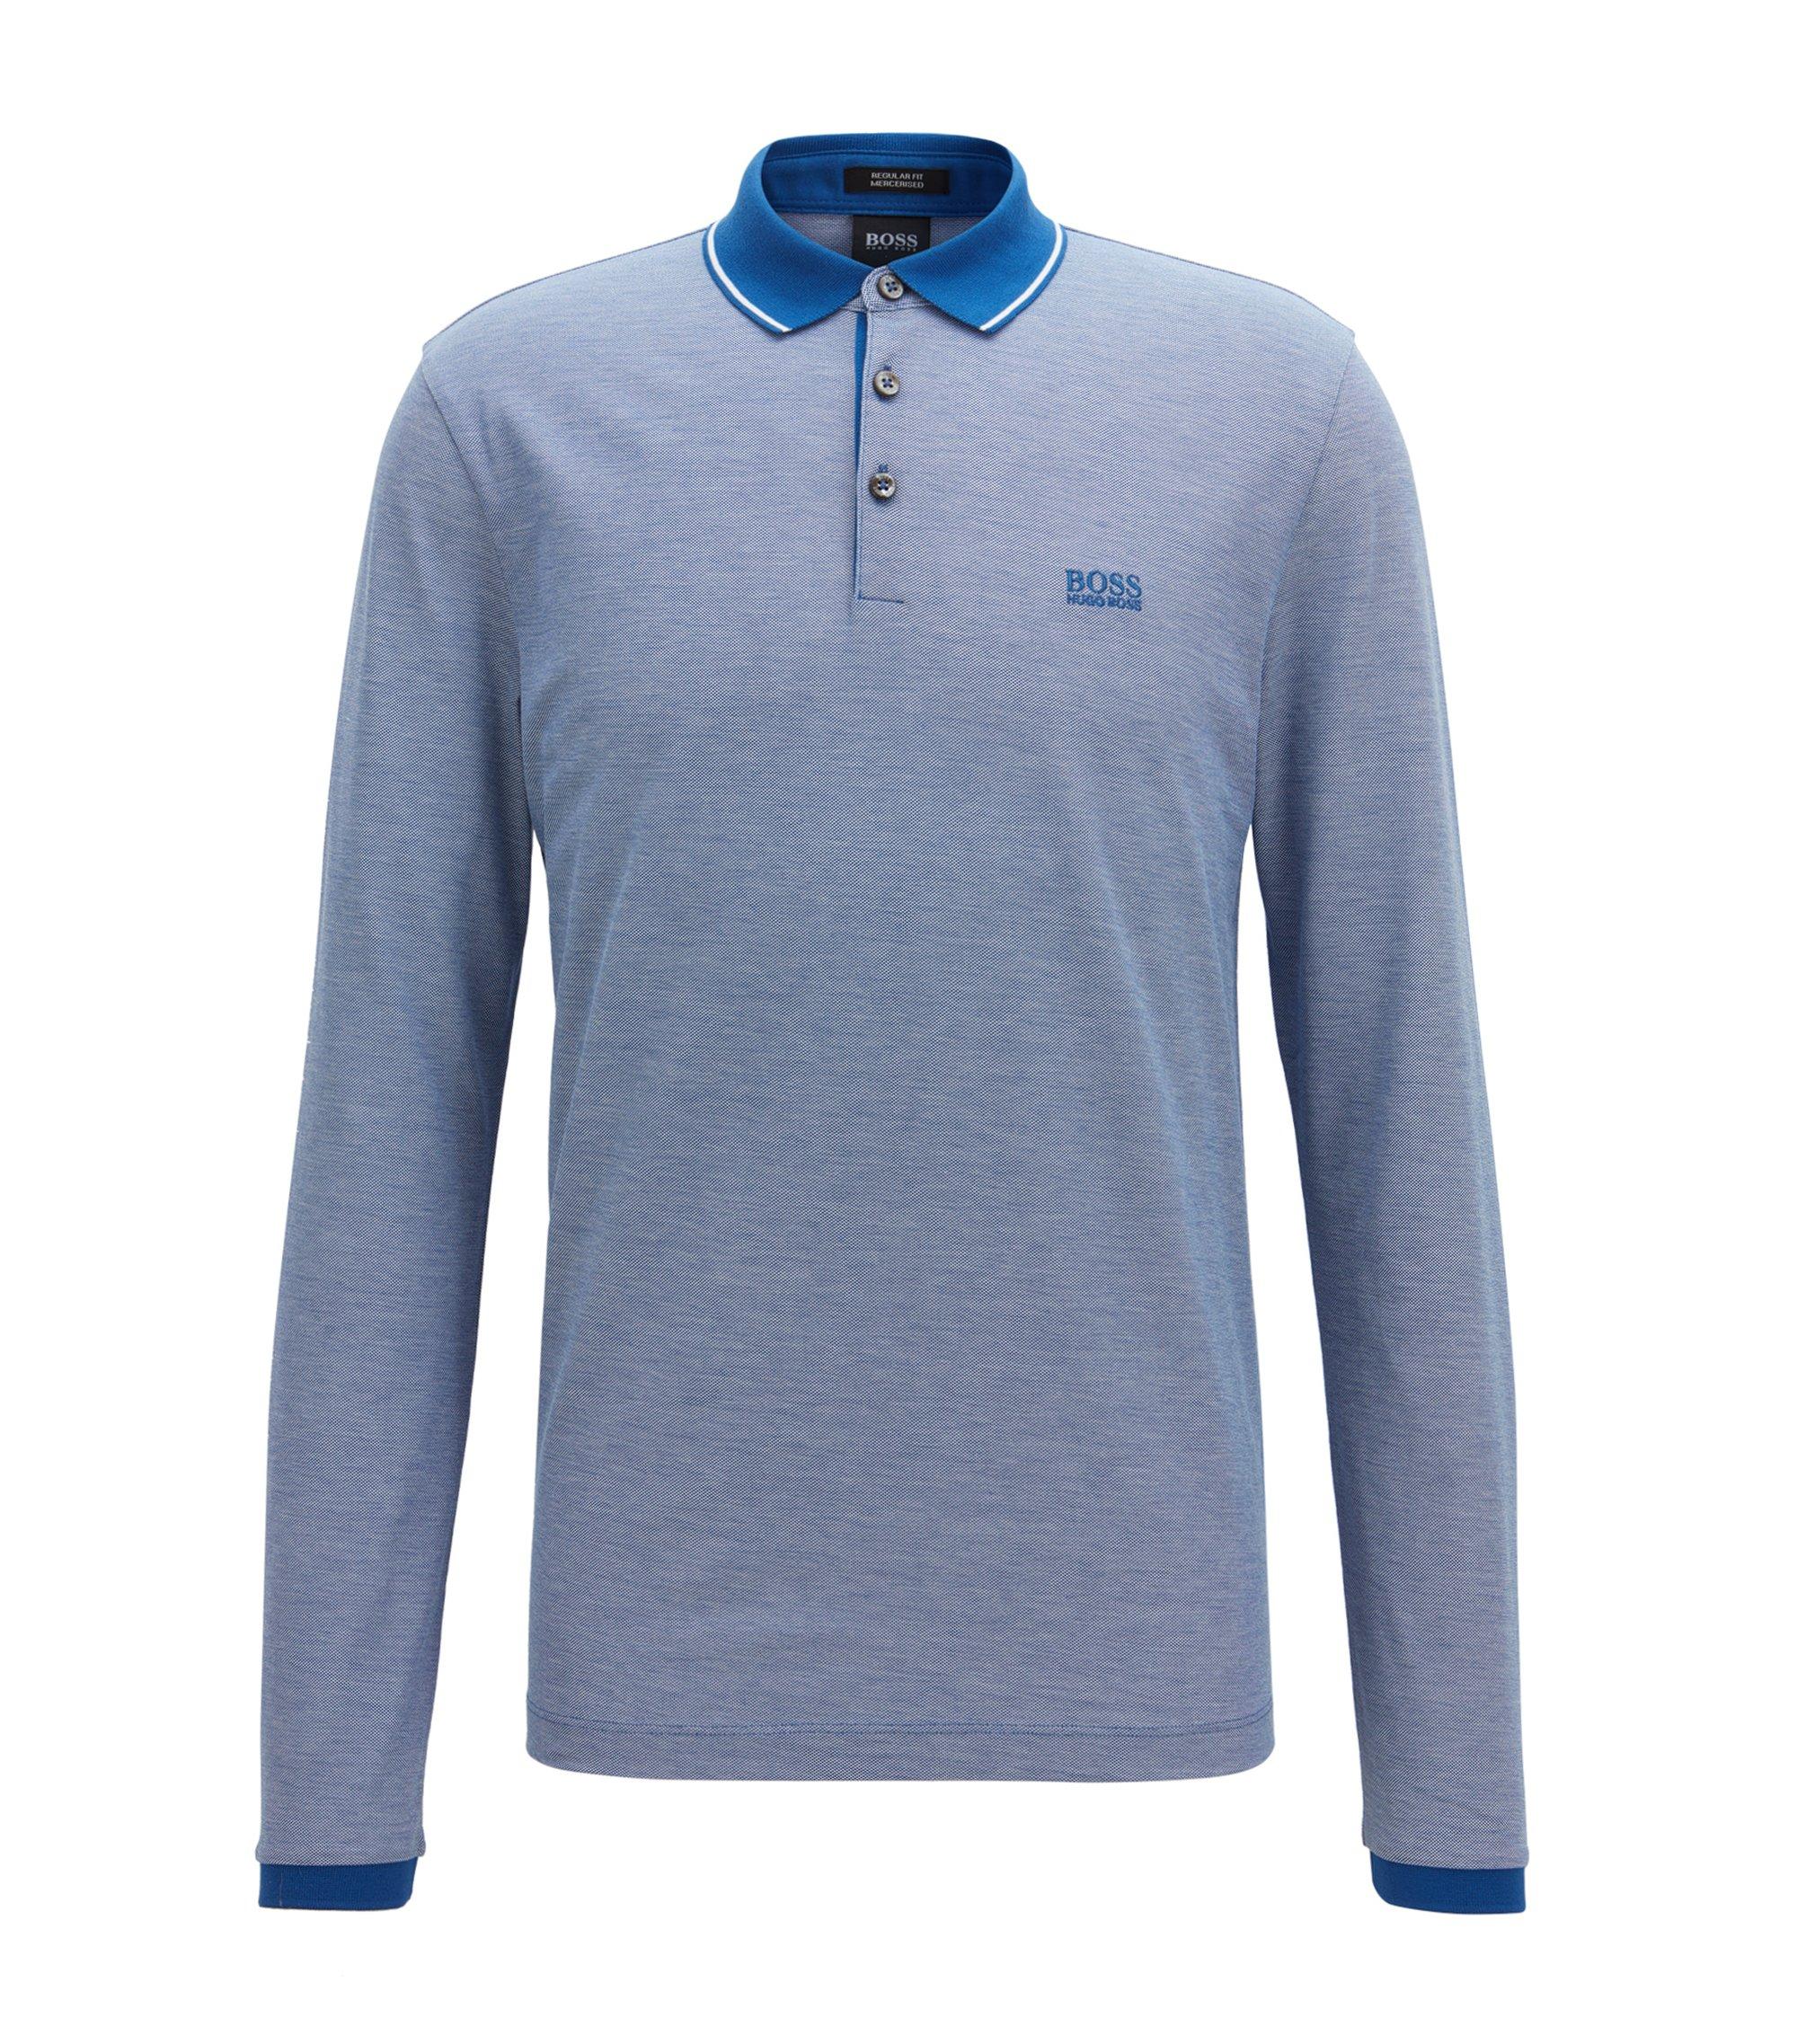 Longsleeve-Poloshirt aus merzerisierter Baumwolle, Blau